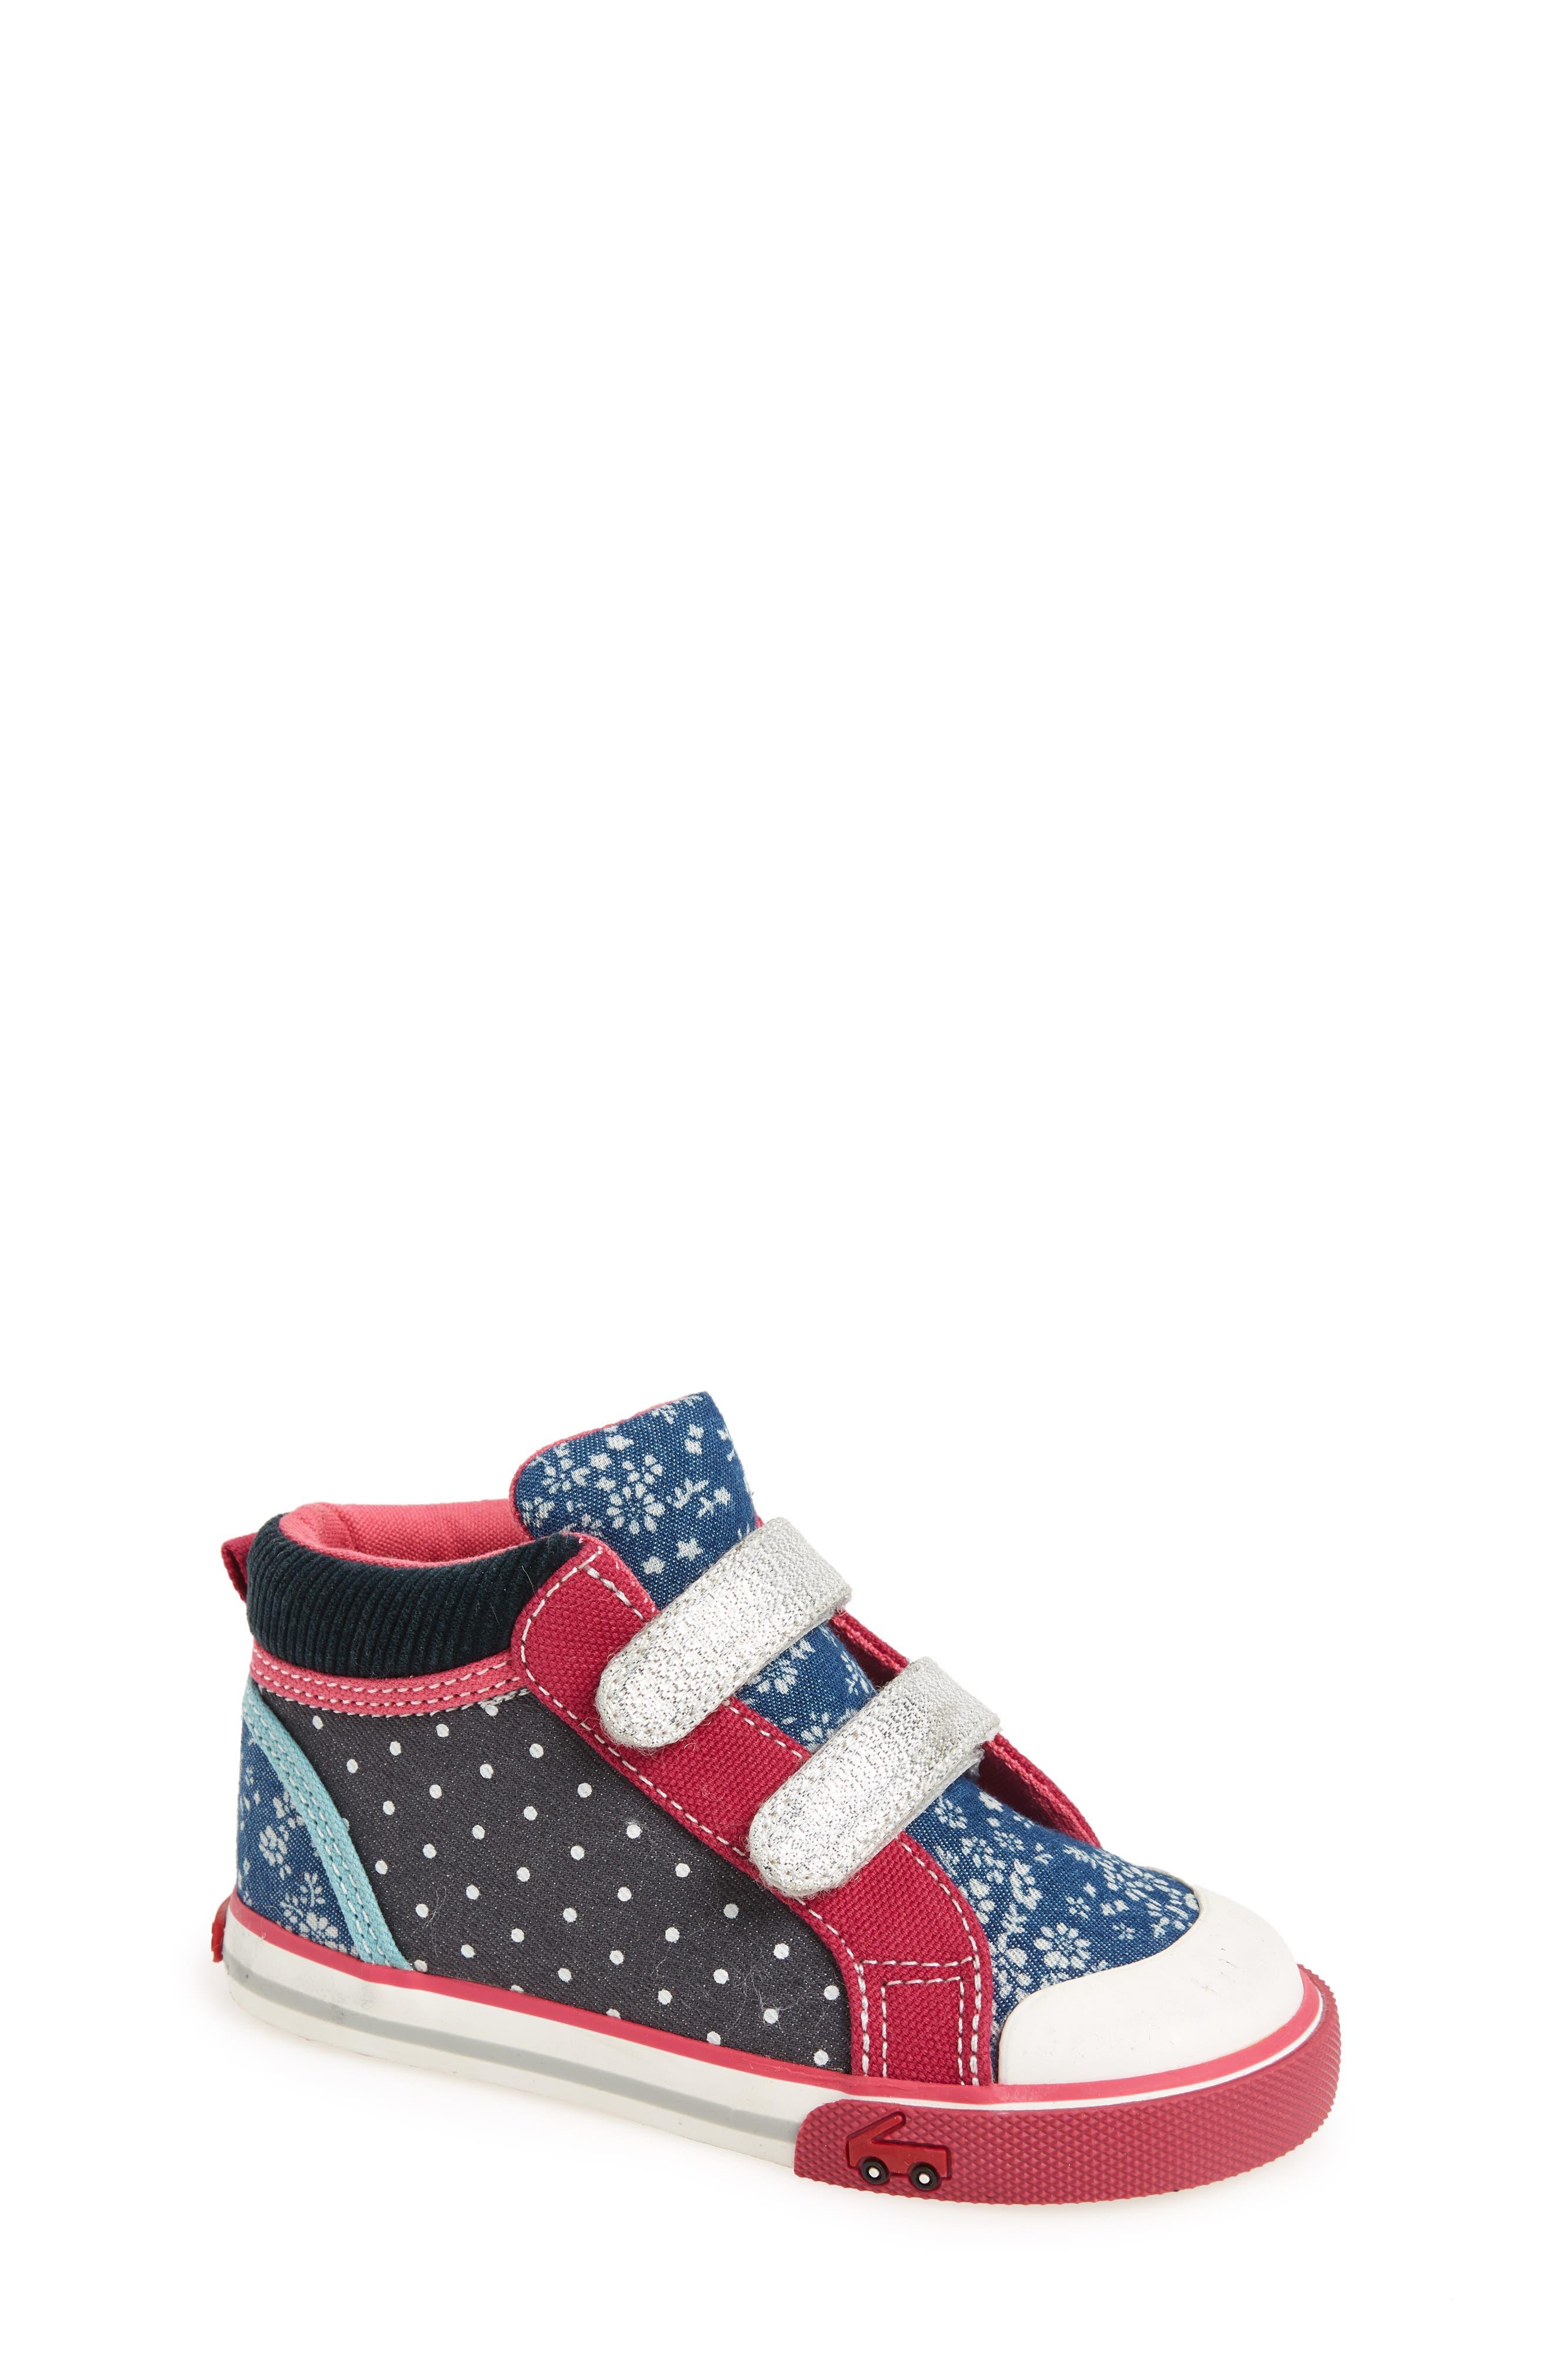 Kya Sneaker,                         Main,                         color, Navy Corduroy/ Multi